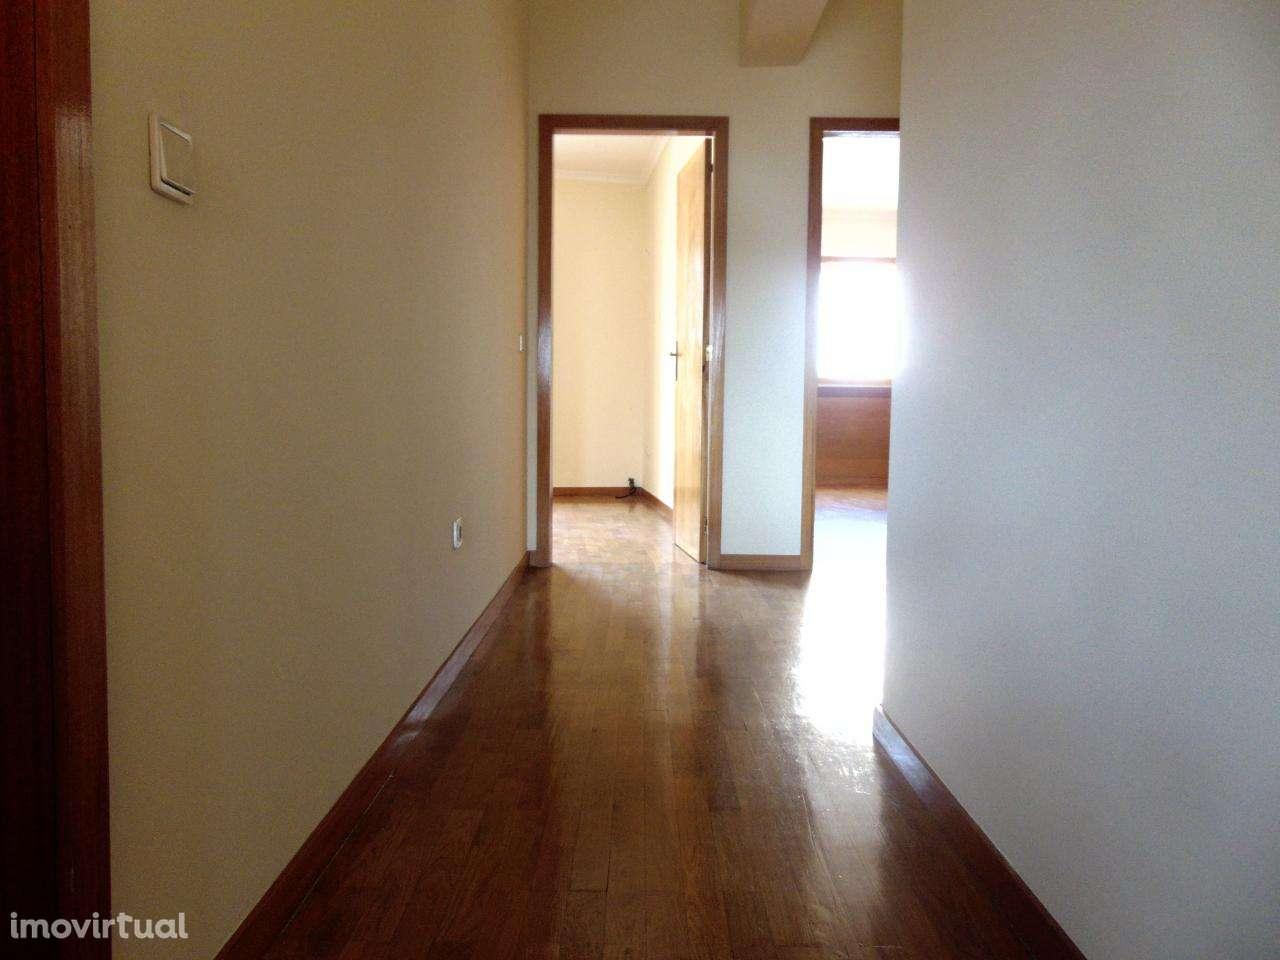 Apartamento para comprar, Vila Nova de Famalicão e Calendário, Vila Nova de Famalicão, Braga - Foto 5